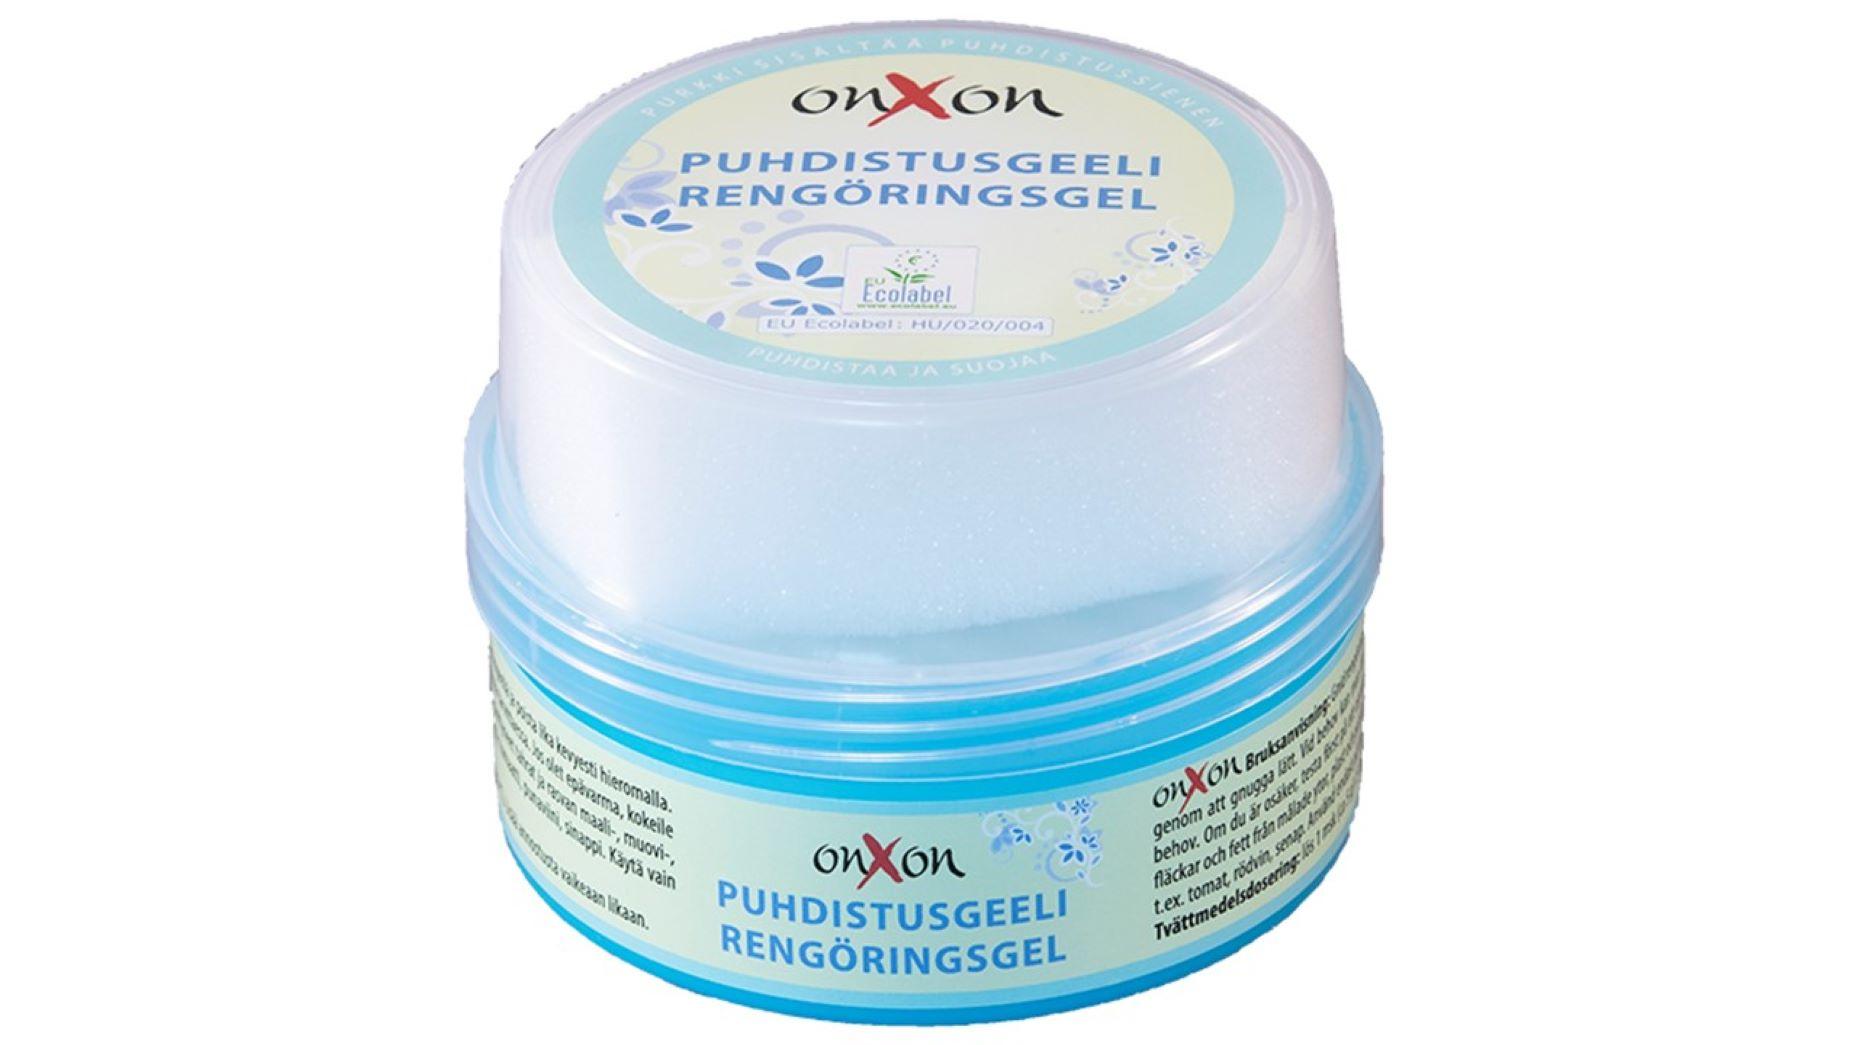 OnXOn Puhdistusgeeli Ecolabel 220g